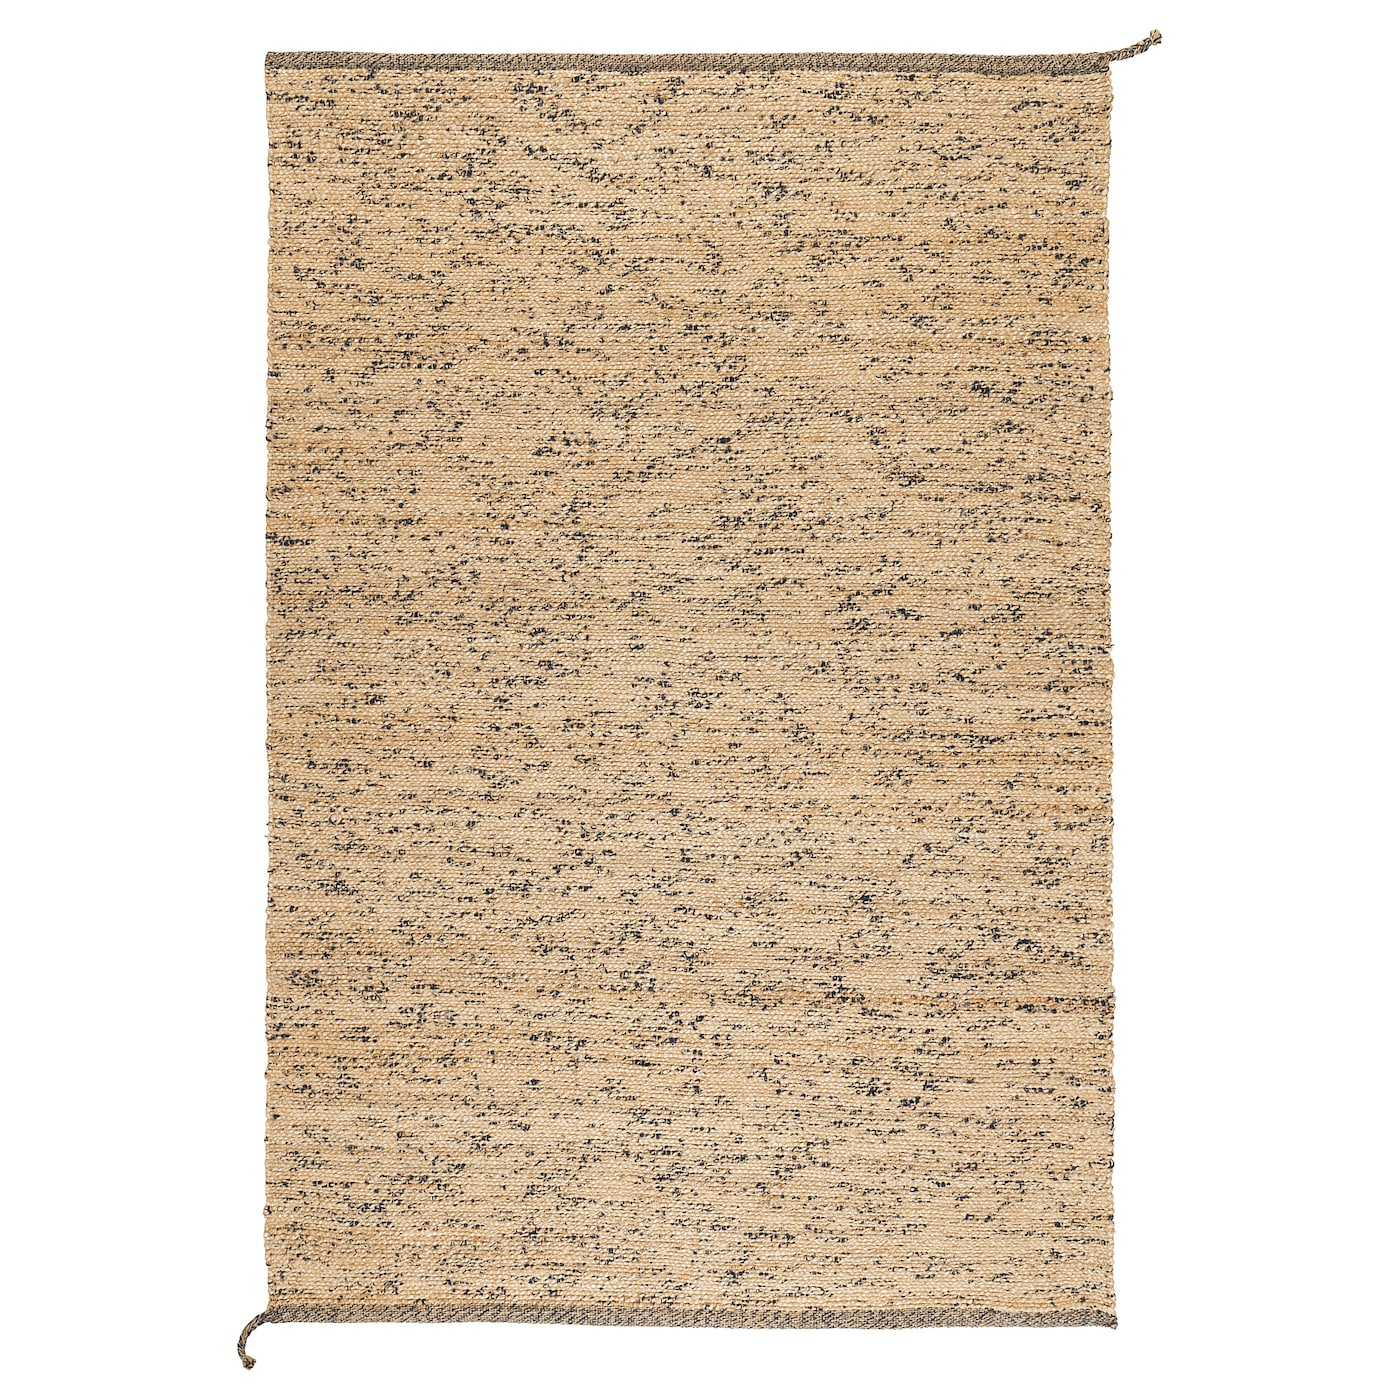 Melholt alfombra a mano natural azul oscuro 133 x 195 cm for Alfombras ikea